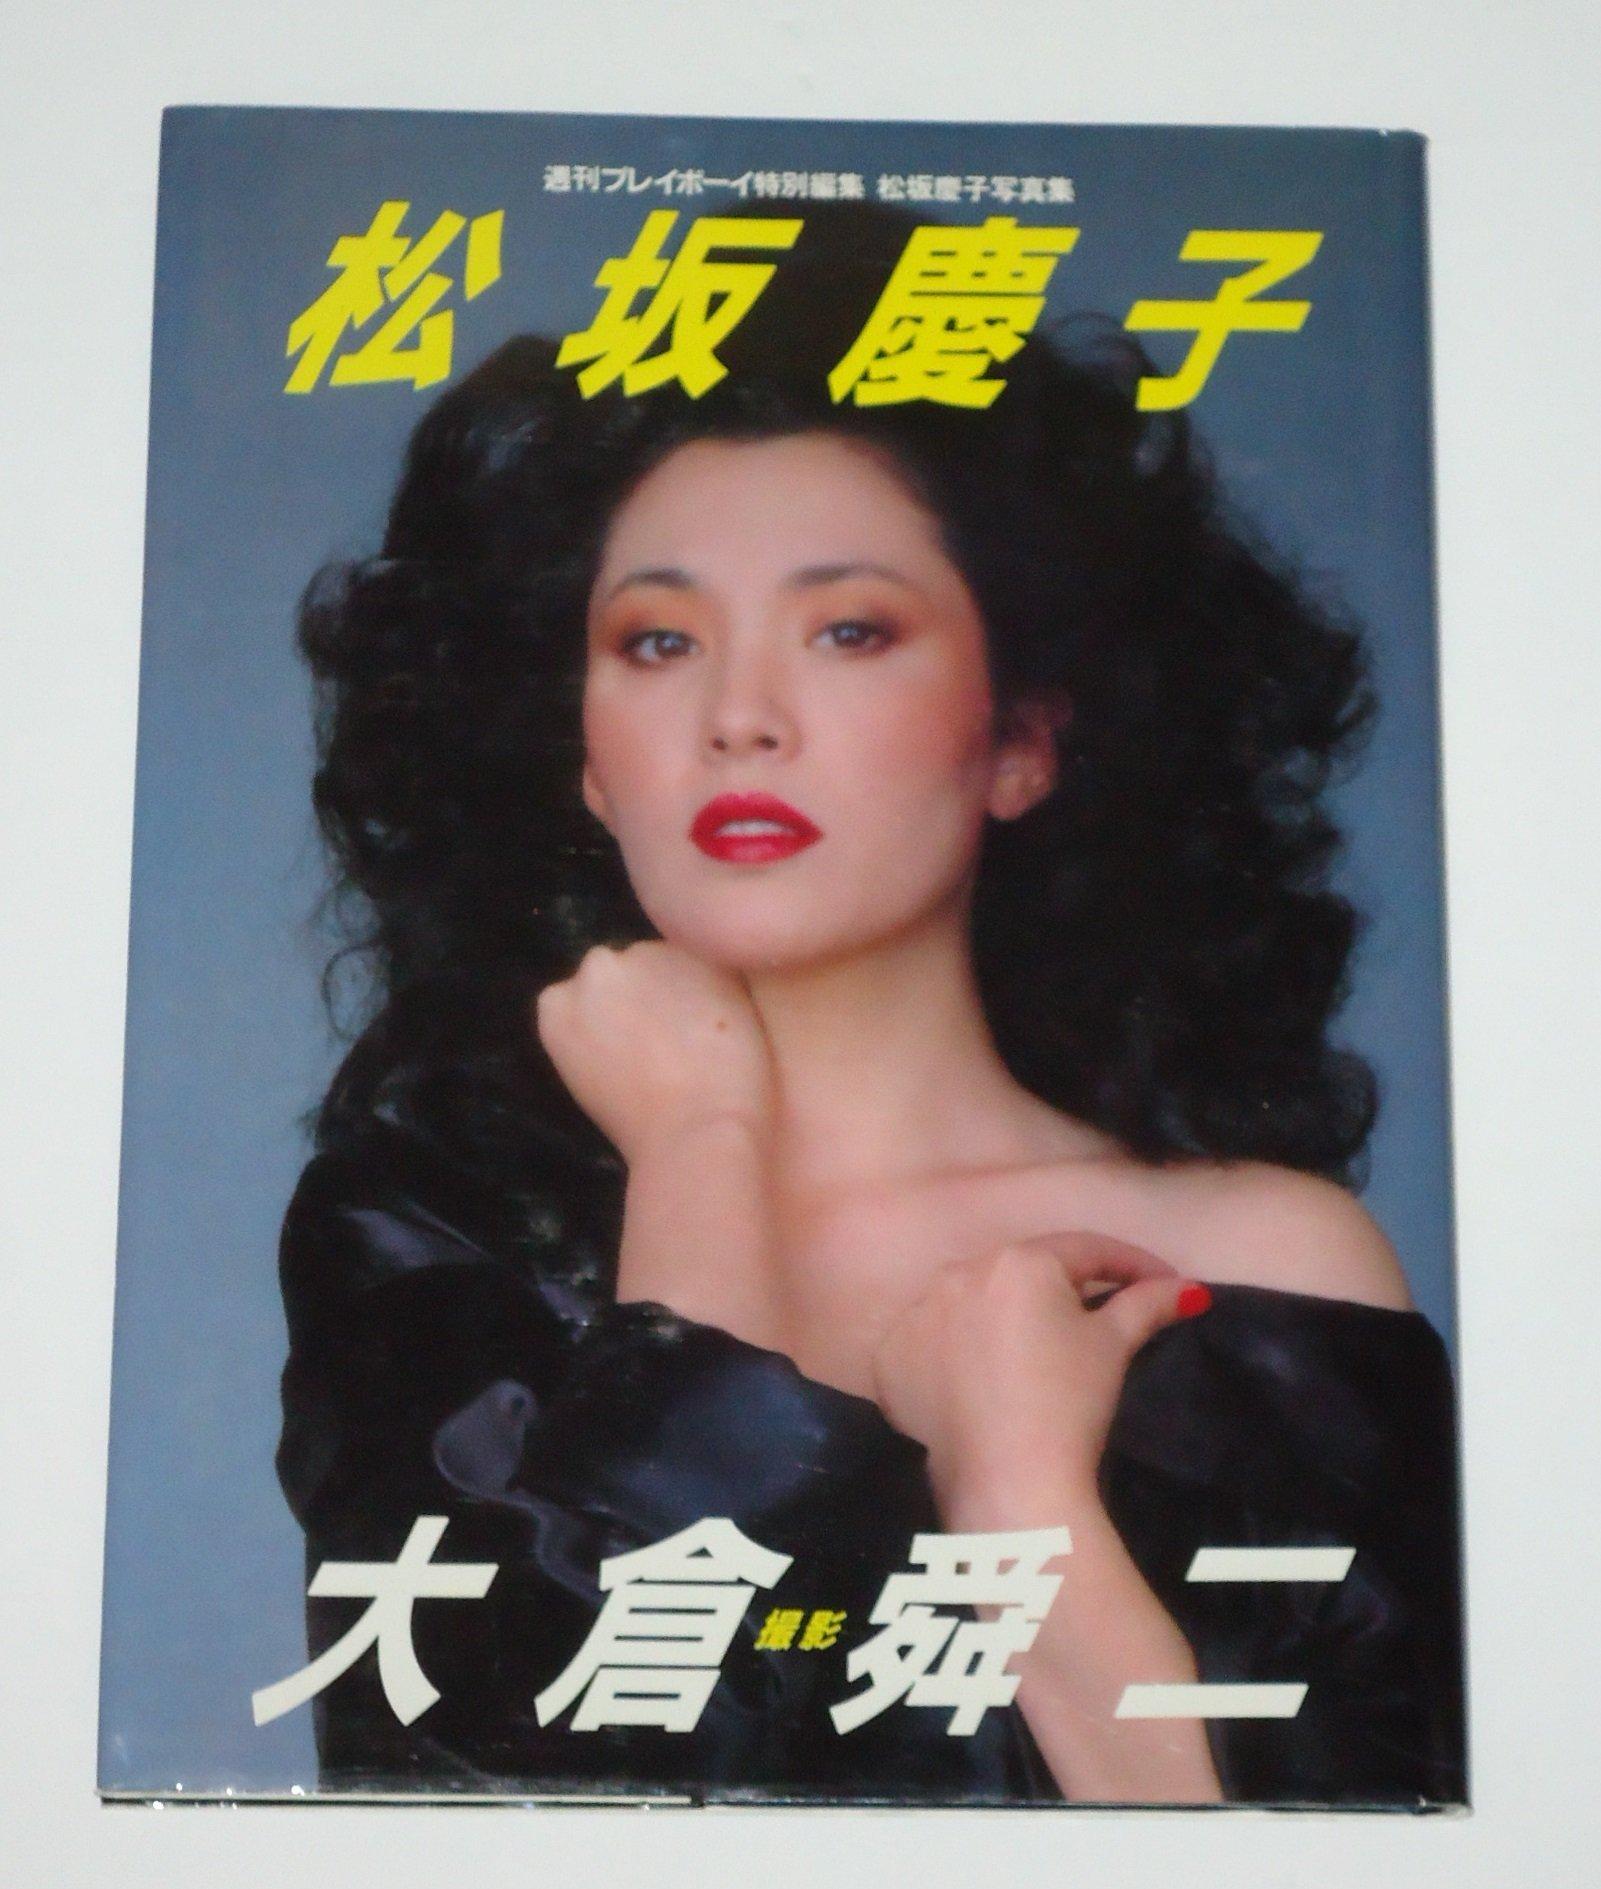 Keiko Matsuzaka naked (51 photos), Topless, Fappening, Selfie, see through 2006